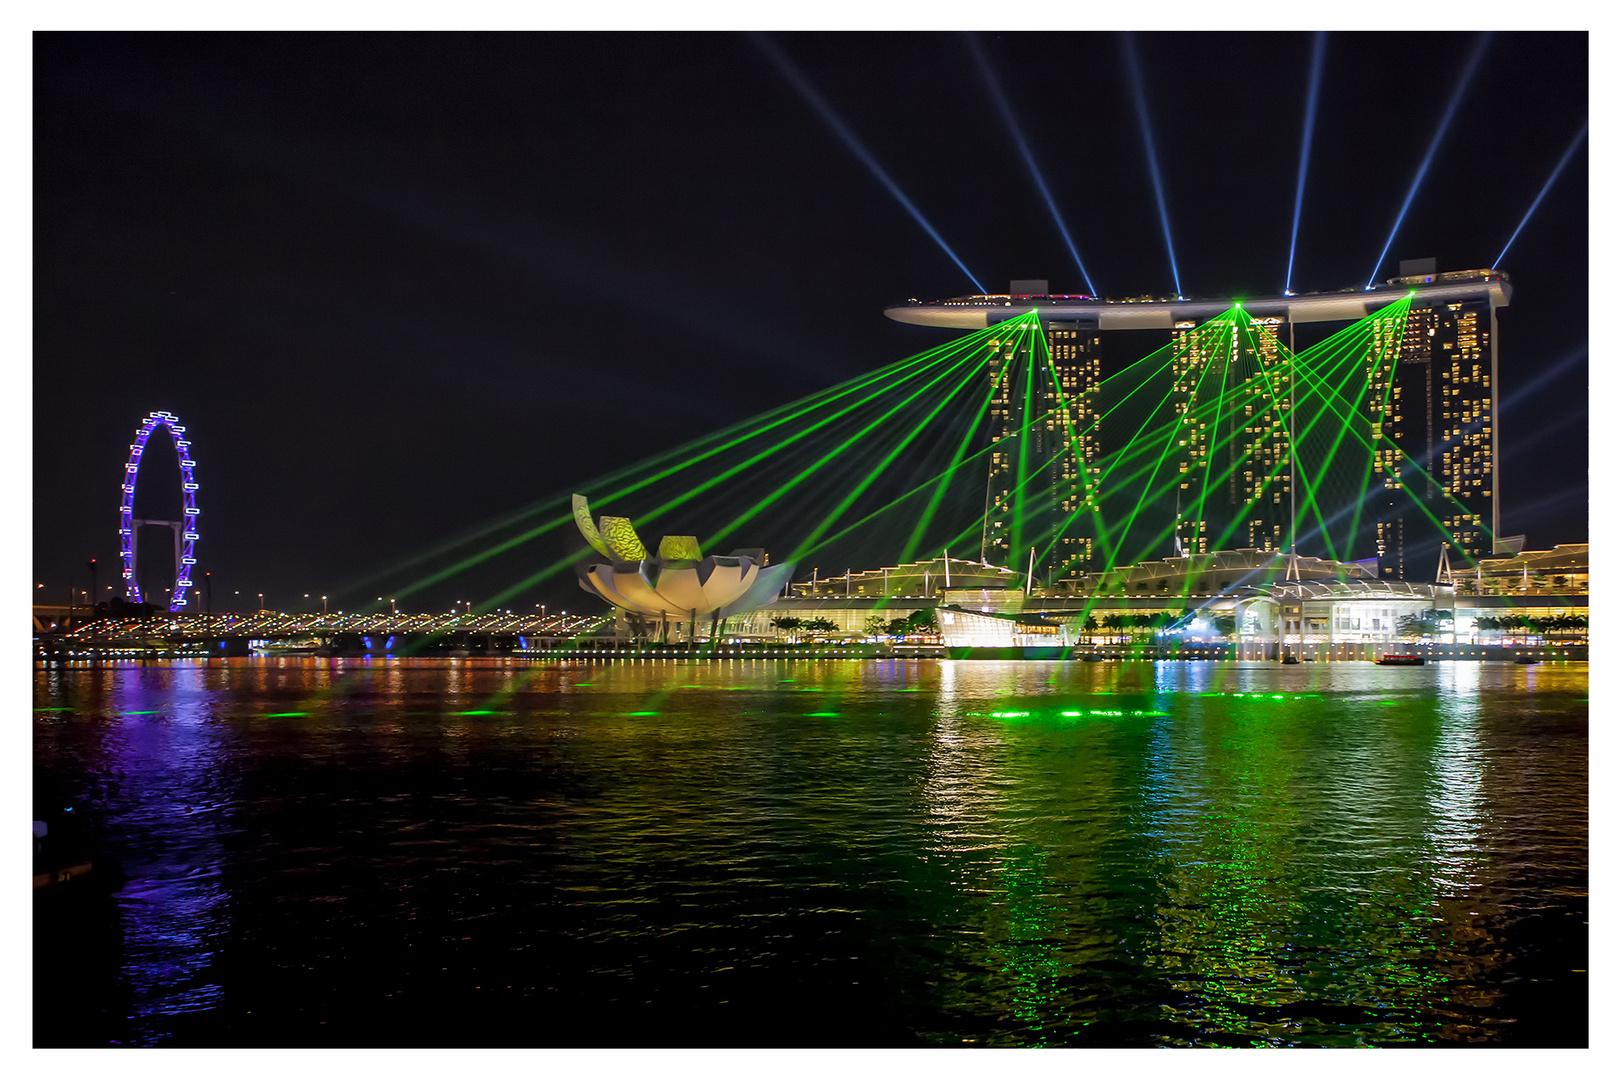 Marina Bay Sands - Laser Show